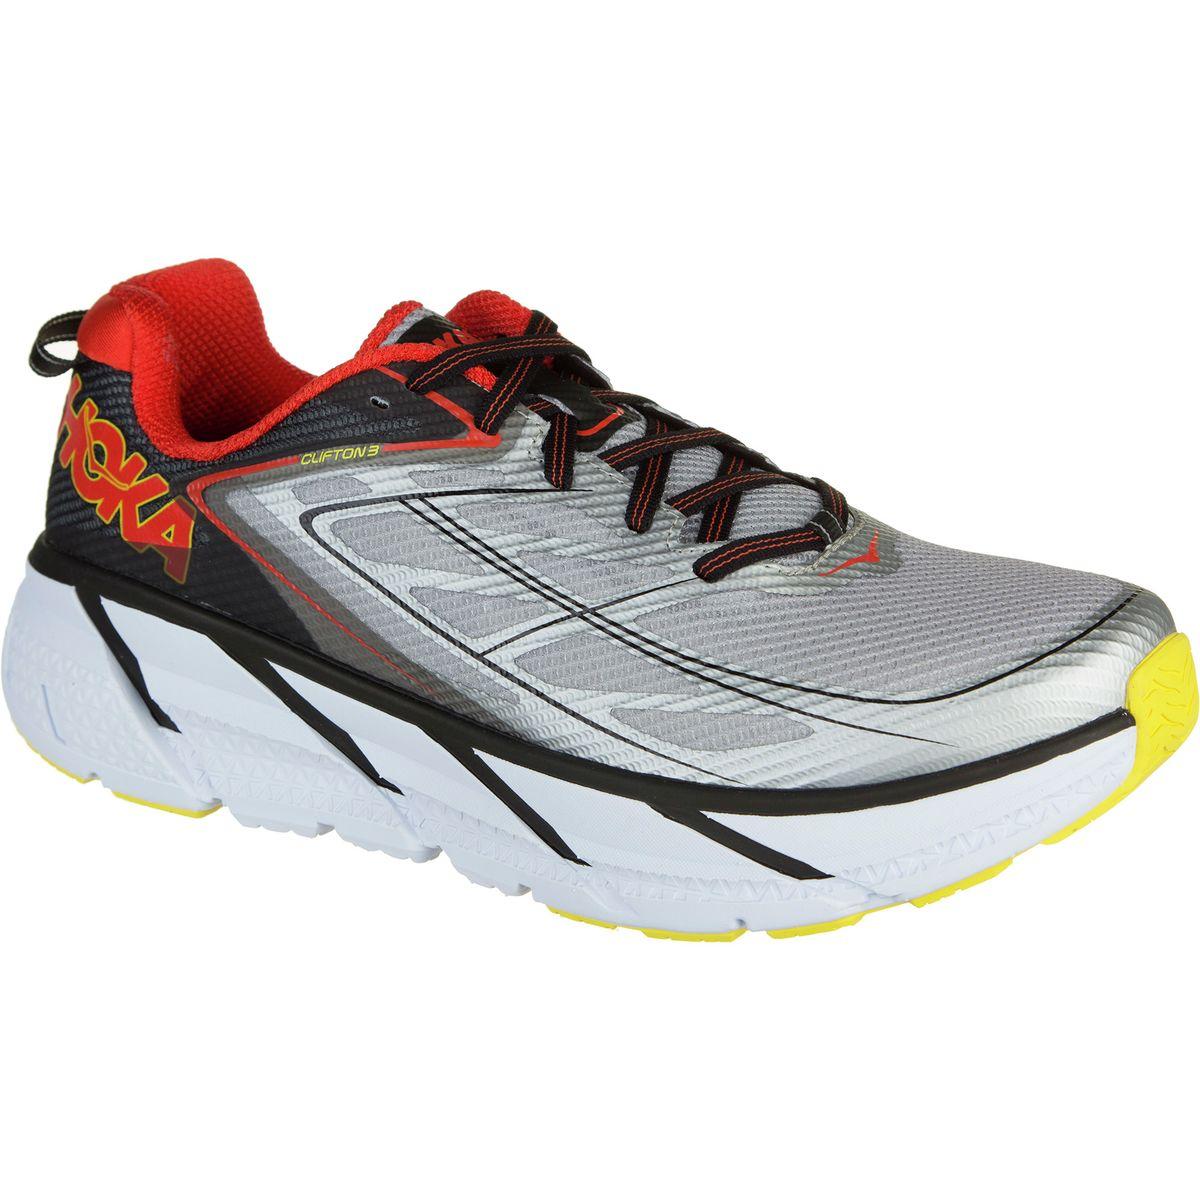 Running Shoes Ames Iowa